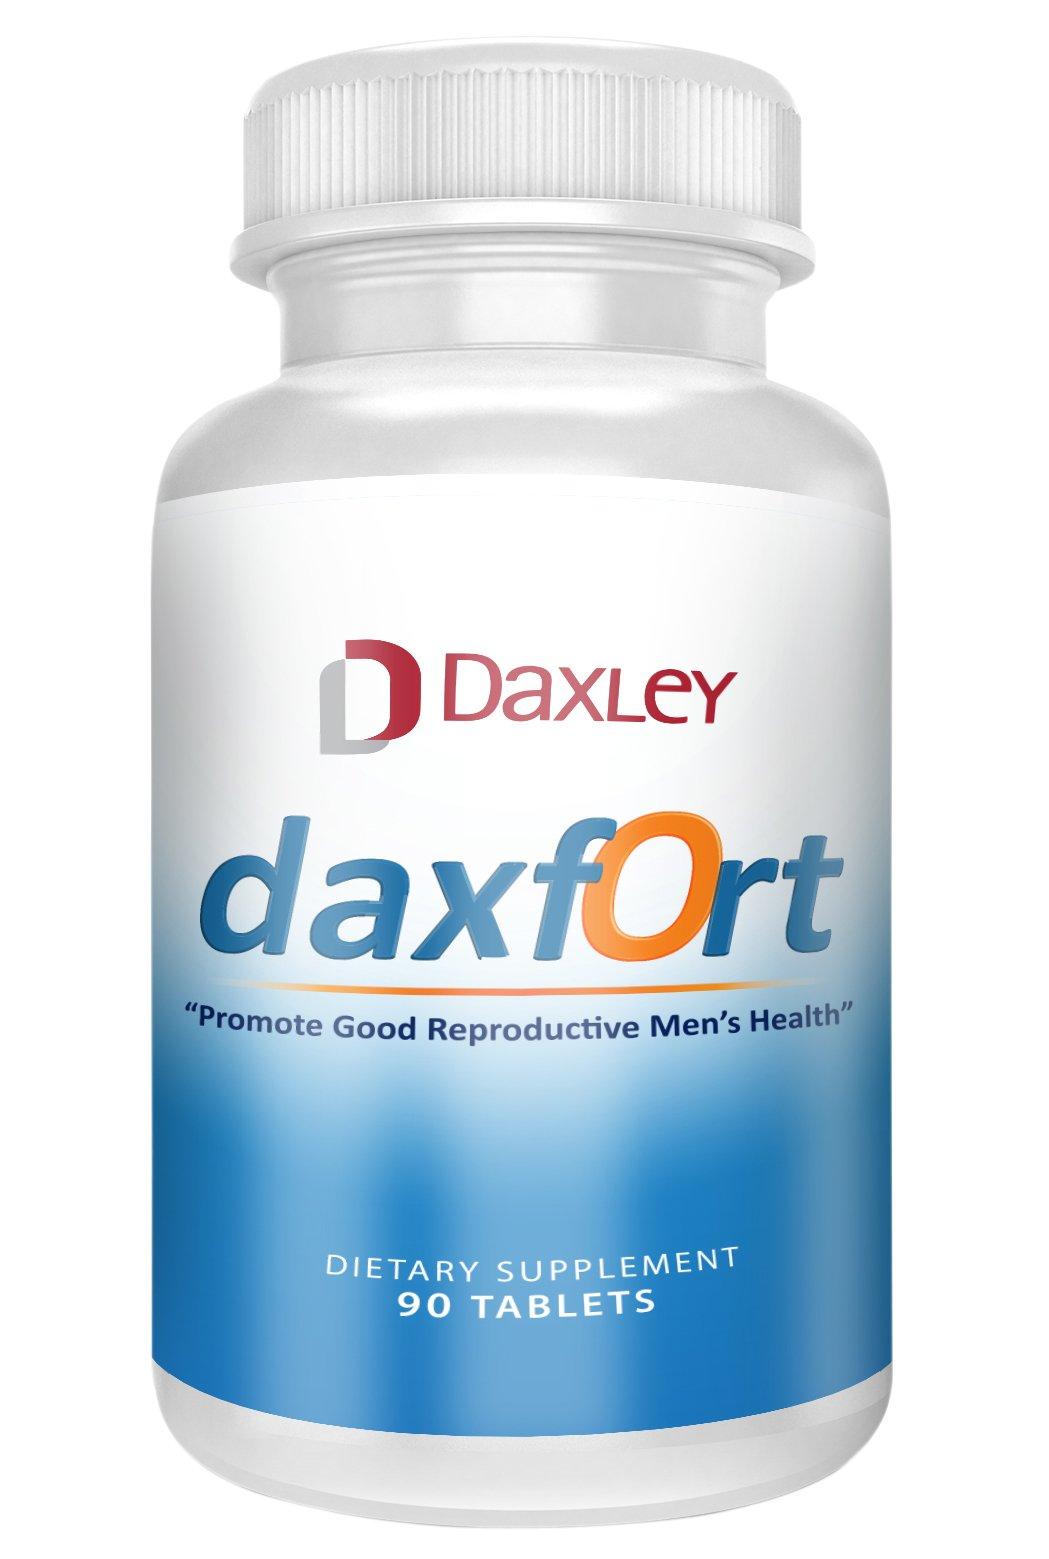 DAXFORT